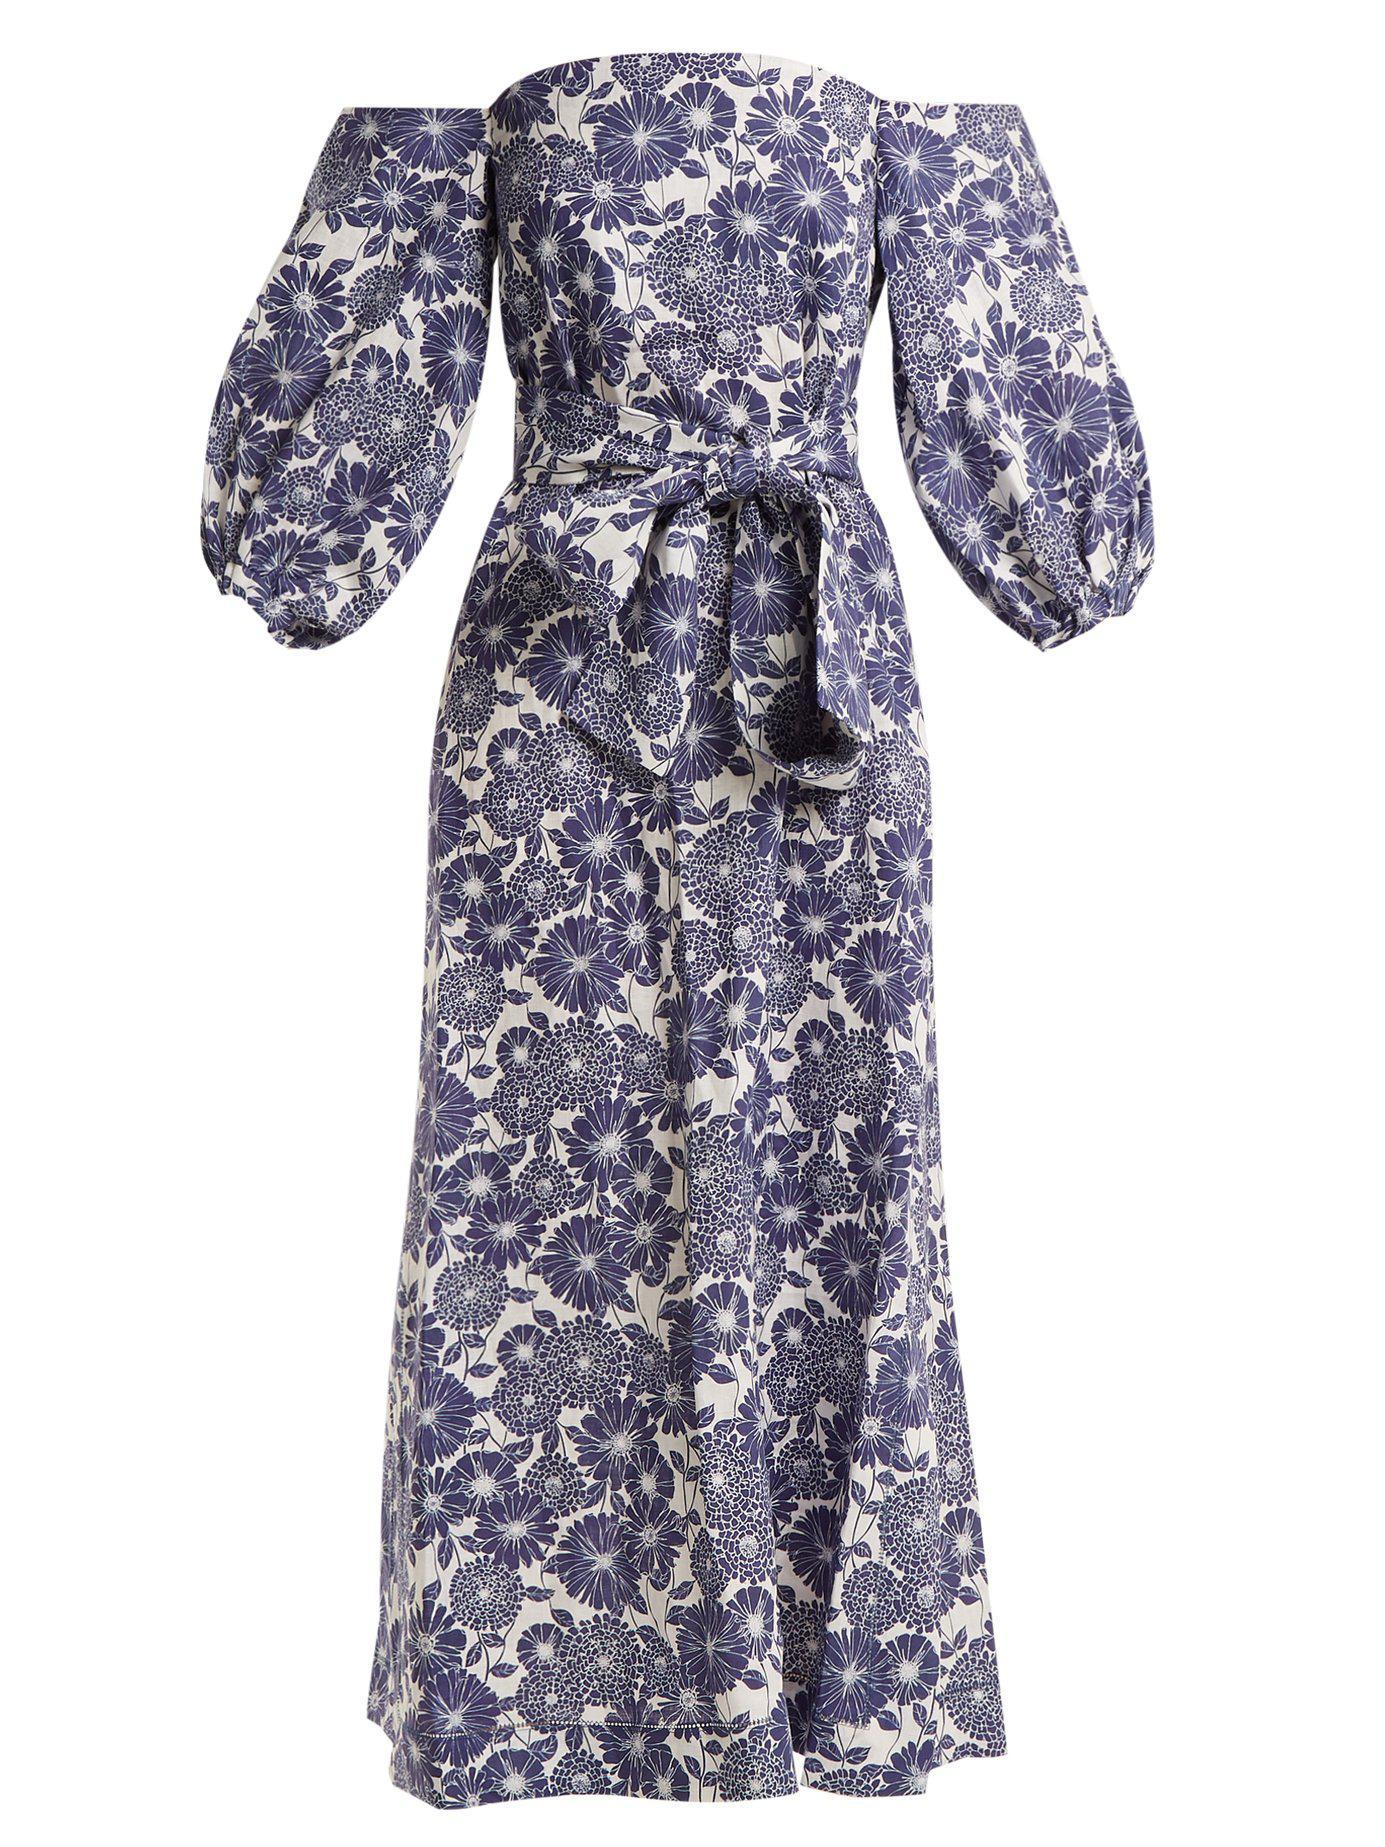 5daf5b3fb5 Lyst - Lisa Marie Fernandez Rosie Floral-print Cotton Dress in Blue